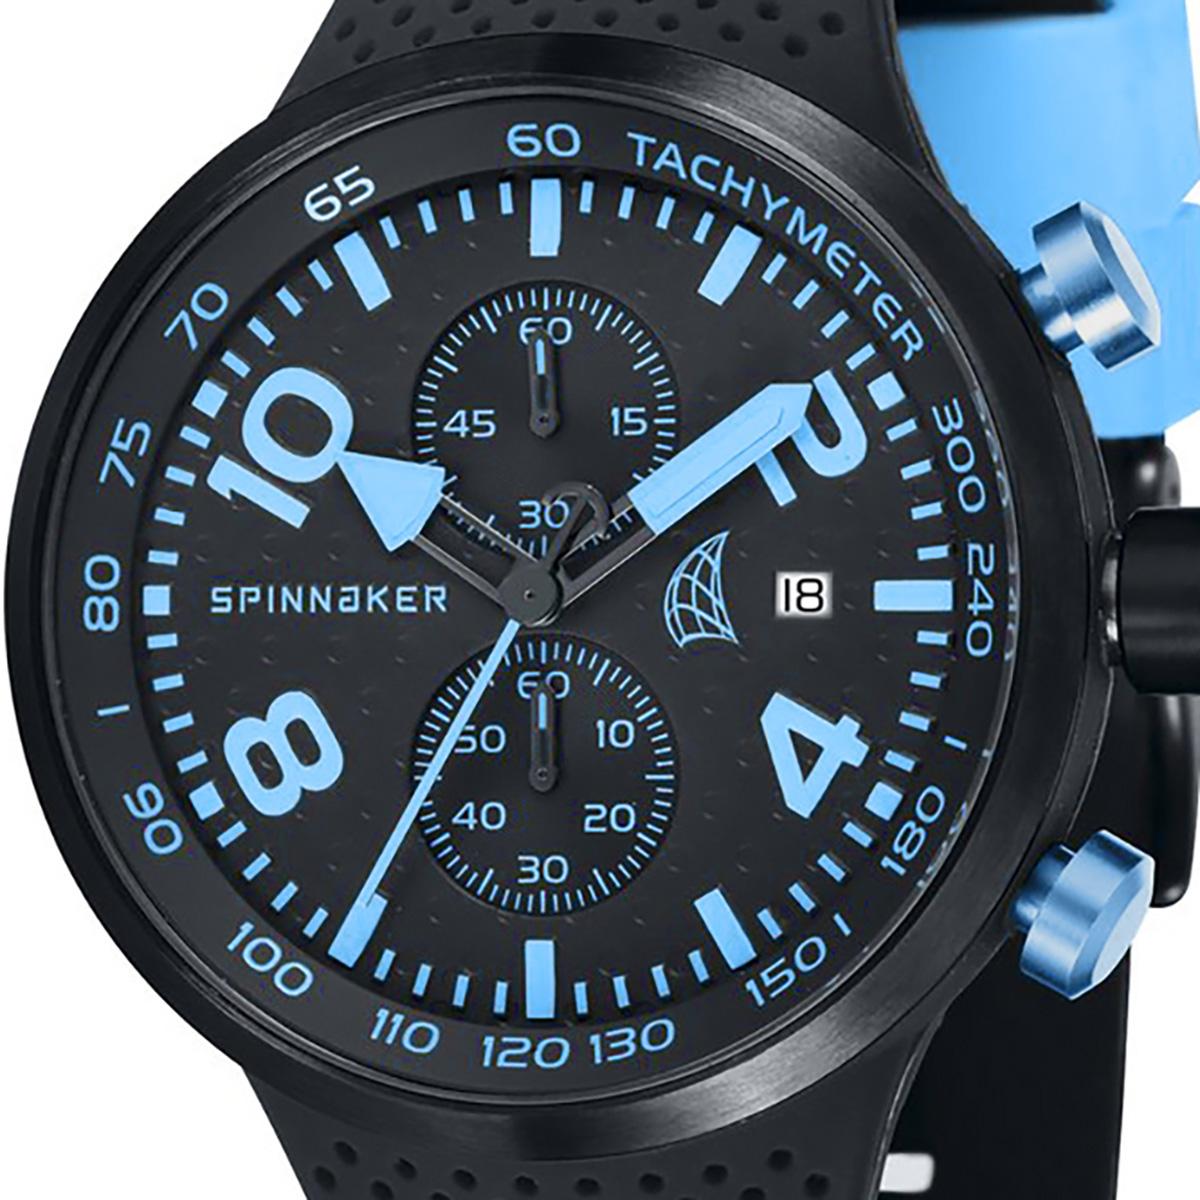 SPINNAKER スピネーカー 電池式クォーツ 腕時計 [SP-5029-04] 並行輸入品  デイト クロノグラフ タキメーターベゼル